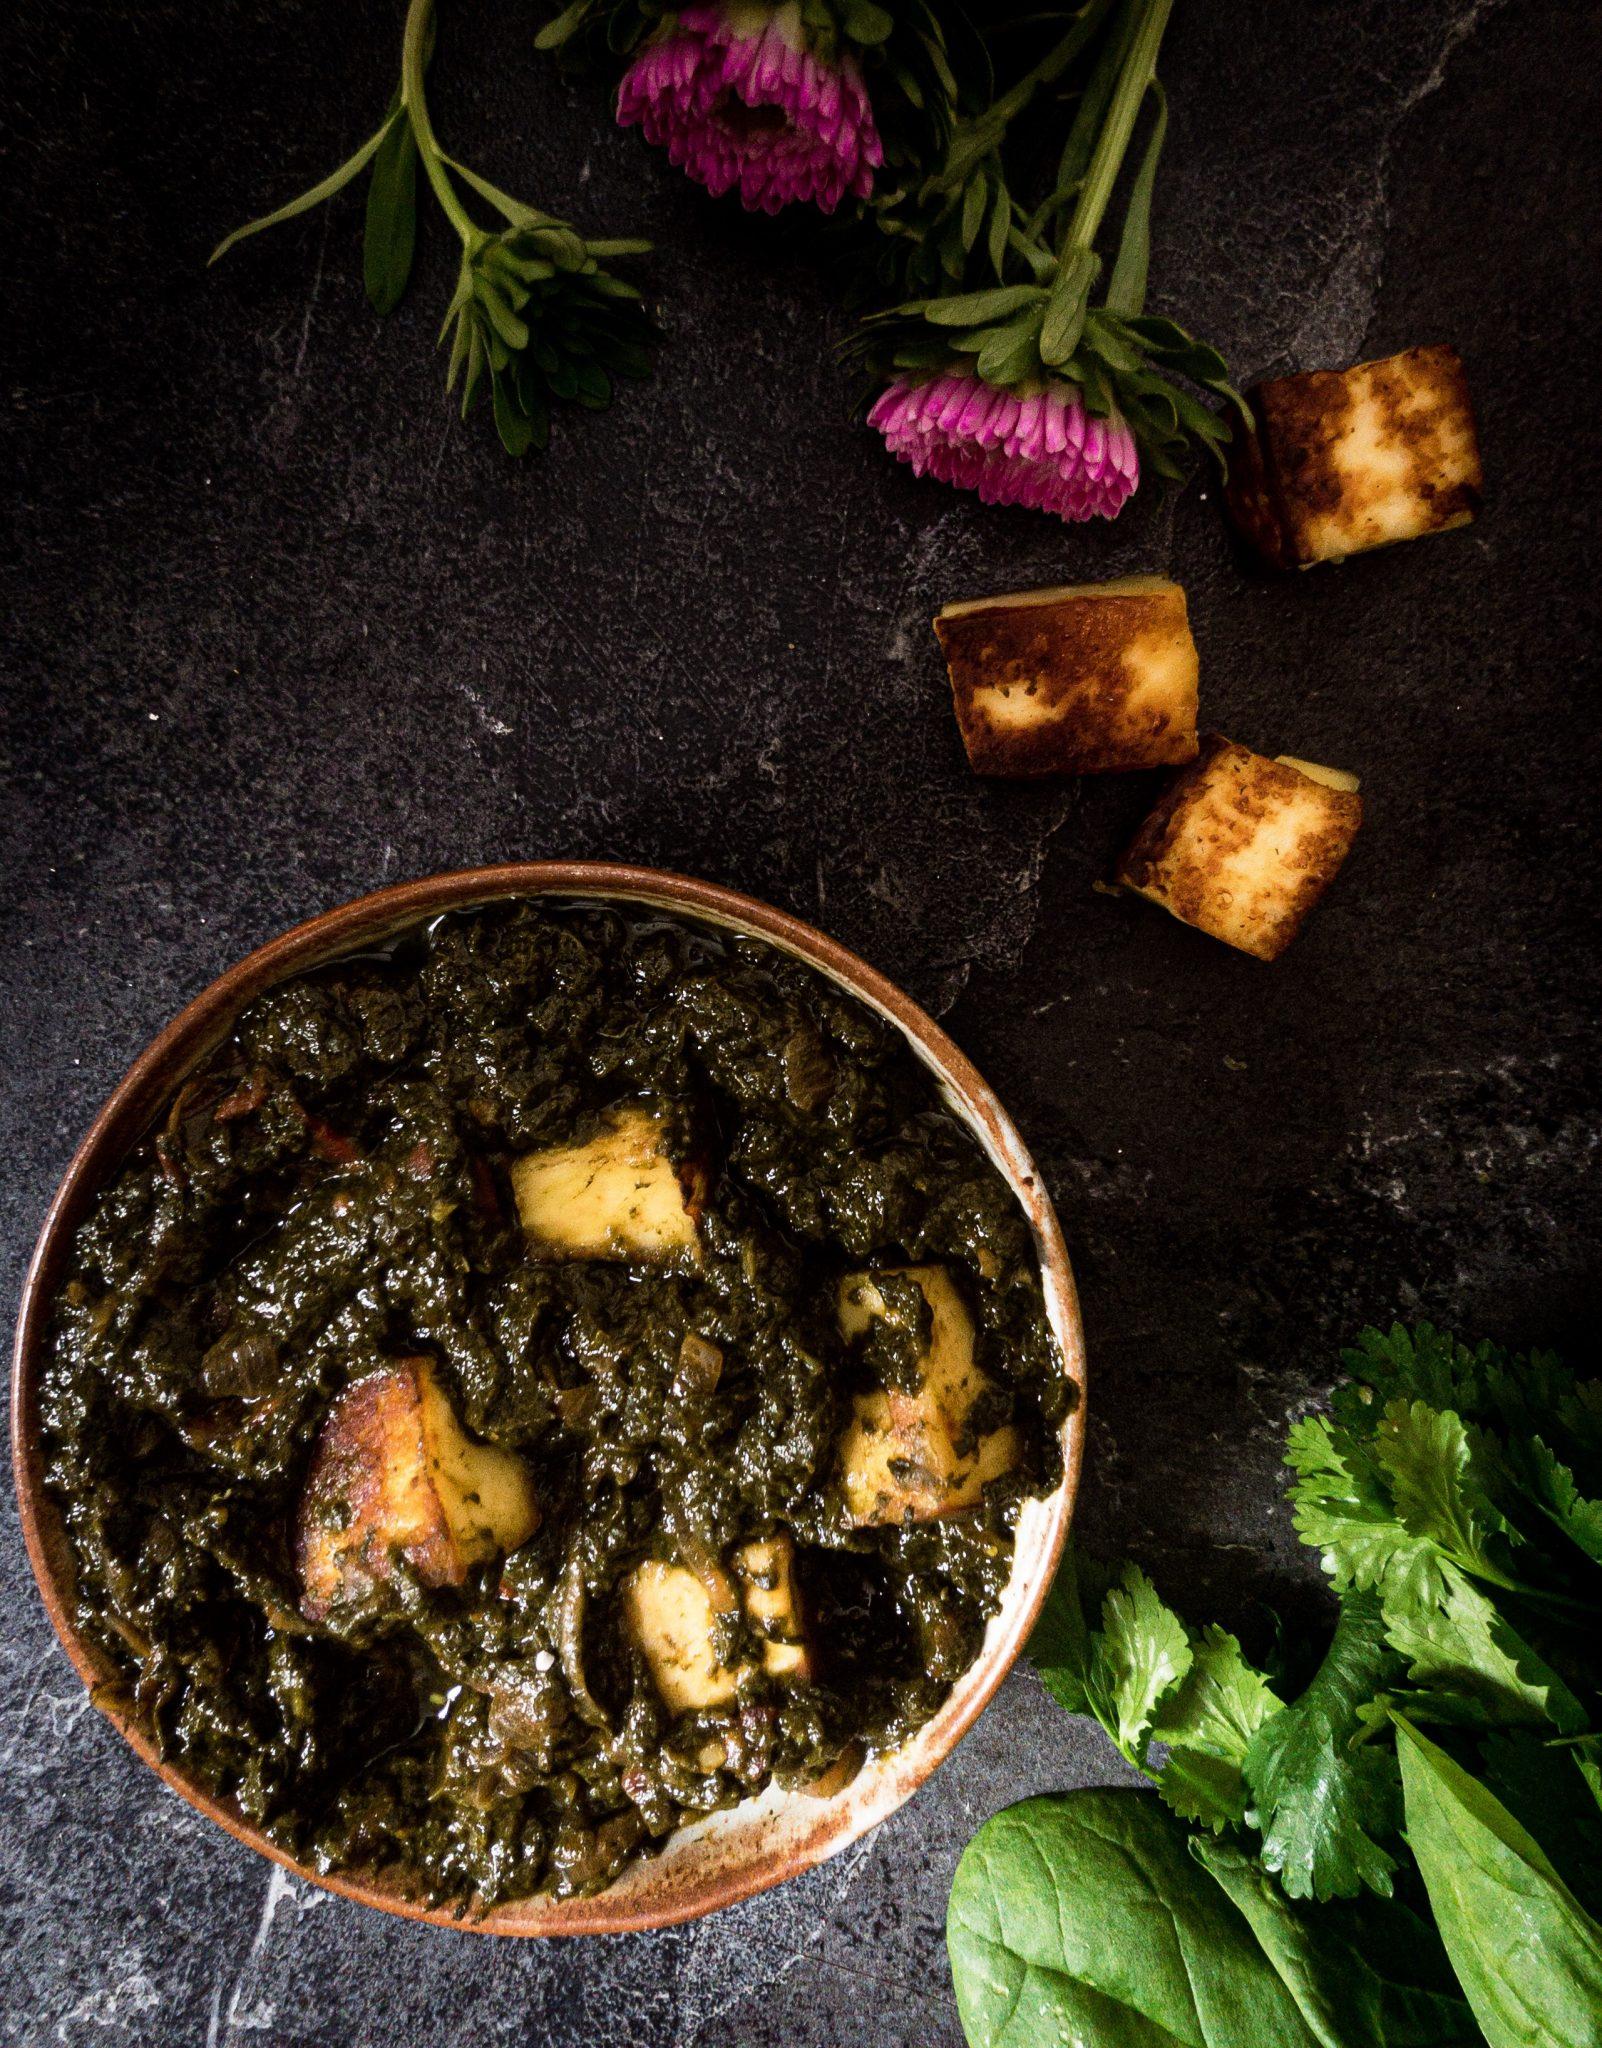 Recipe for Making Palak Paneer